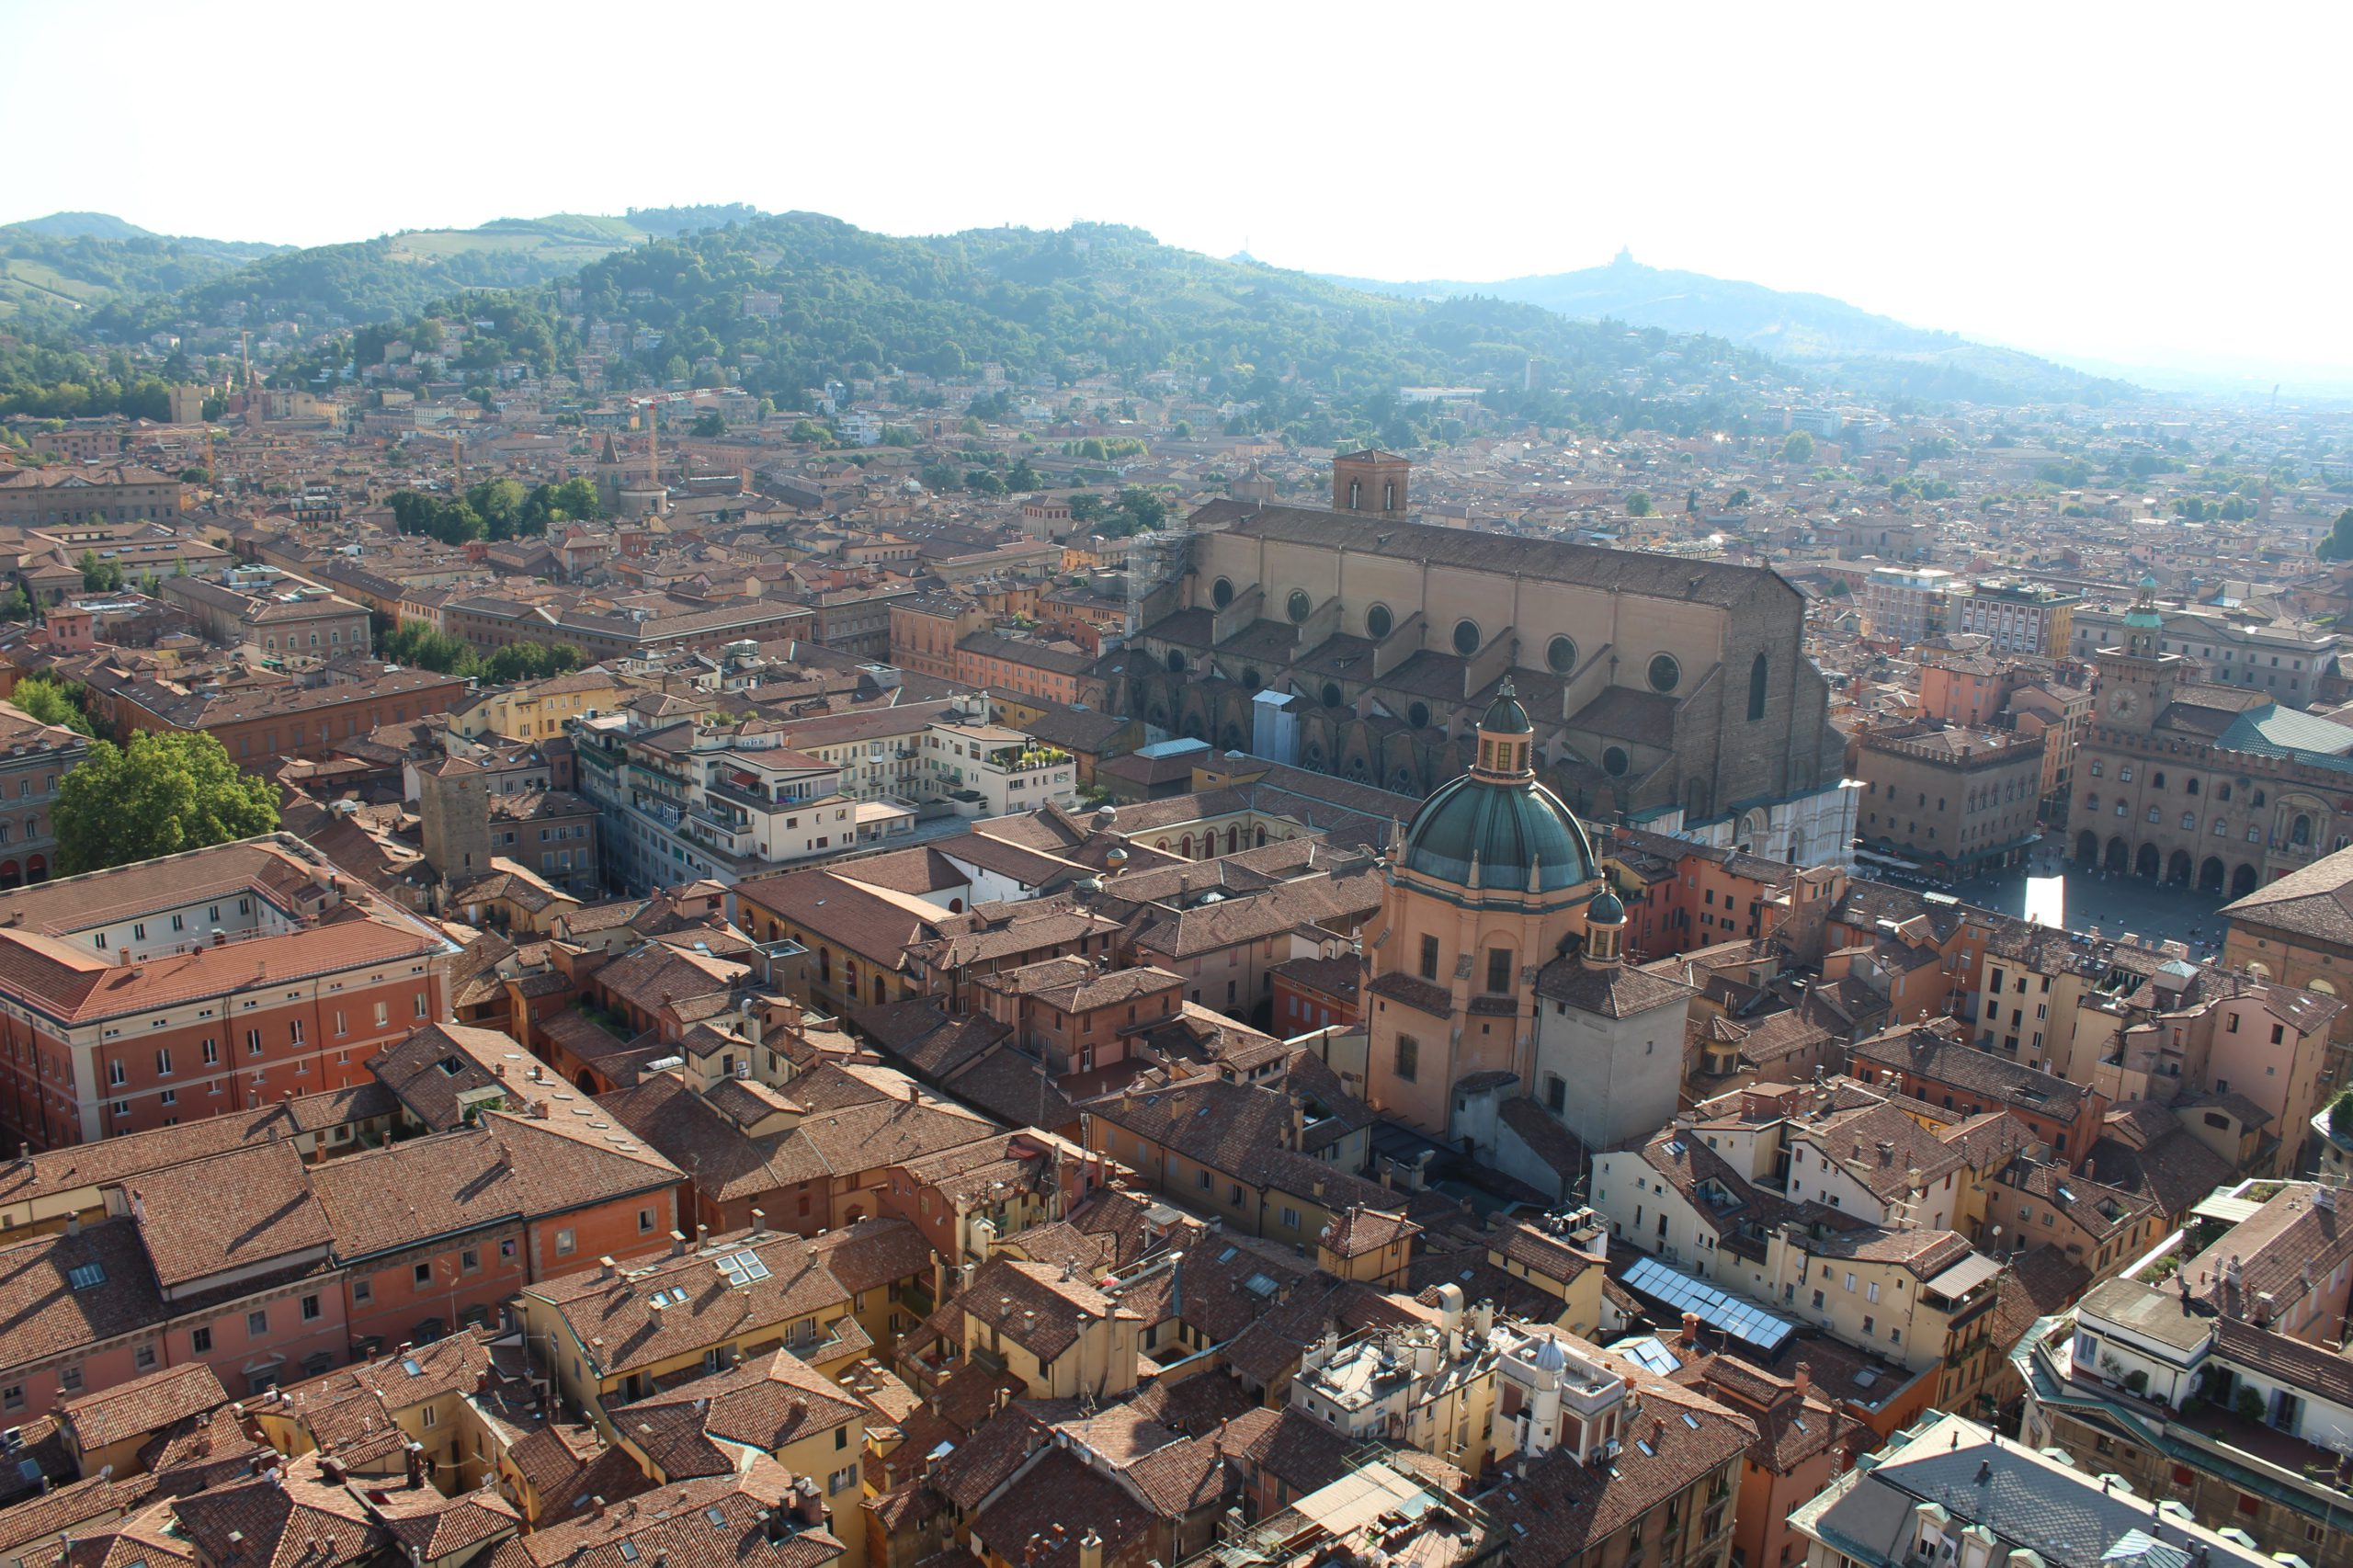 [Emilia Romagna Art Cities] Bologna in 3 minutes